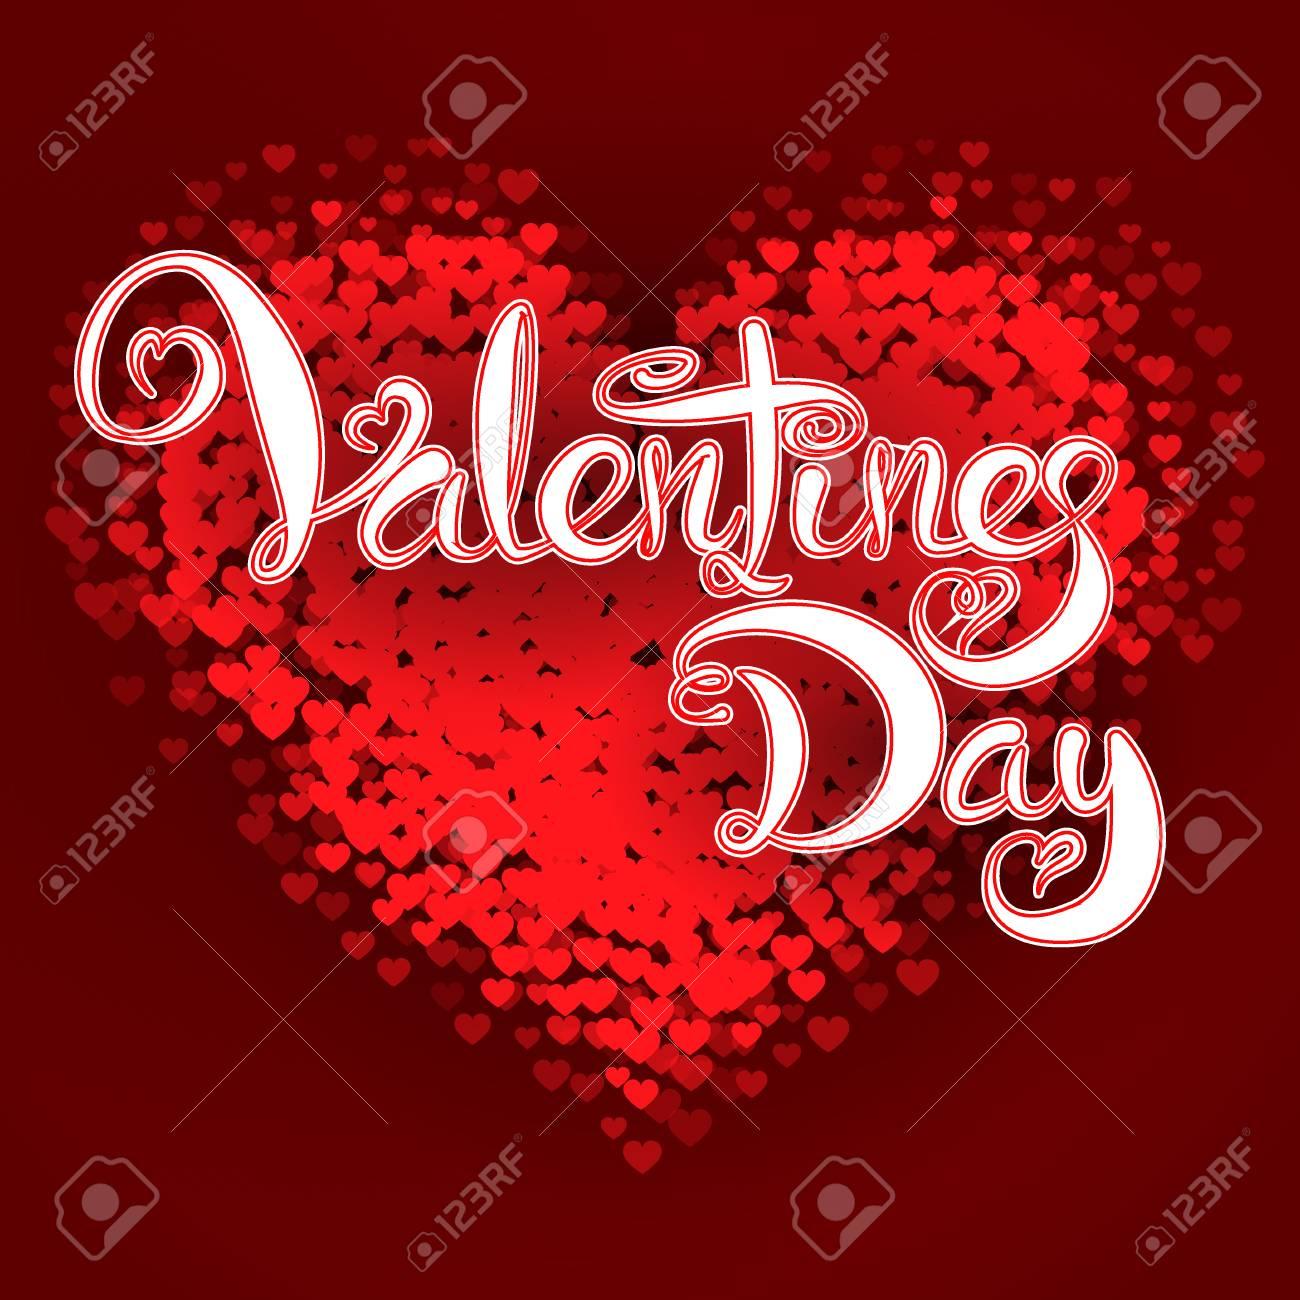 Vector Illustration Of Valentines Day Lettering Card For Design ...